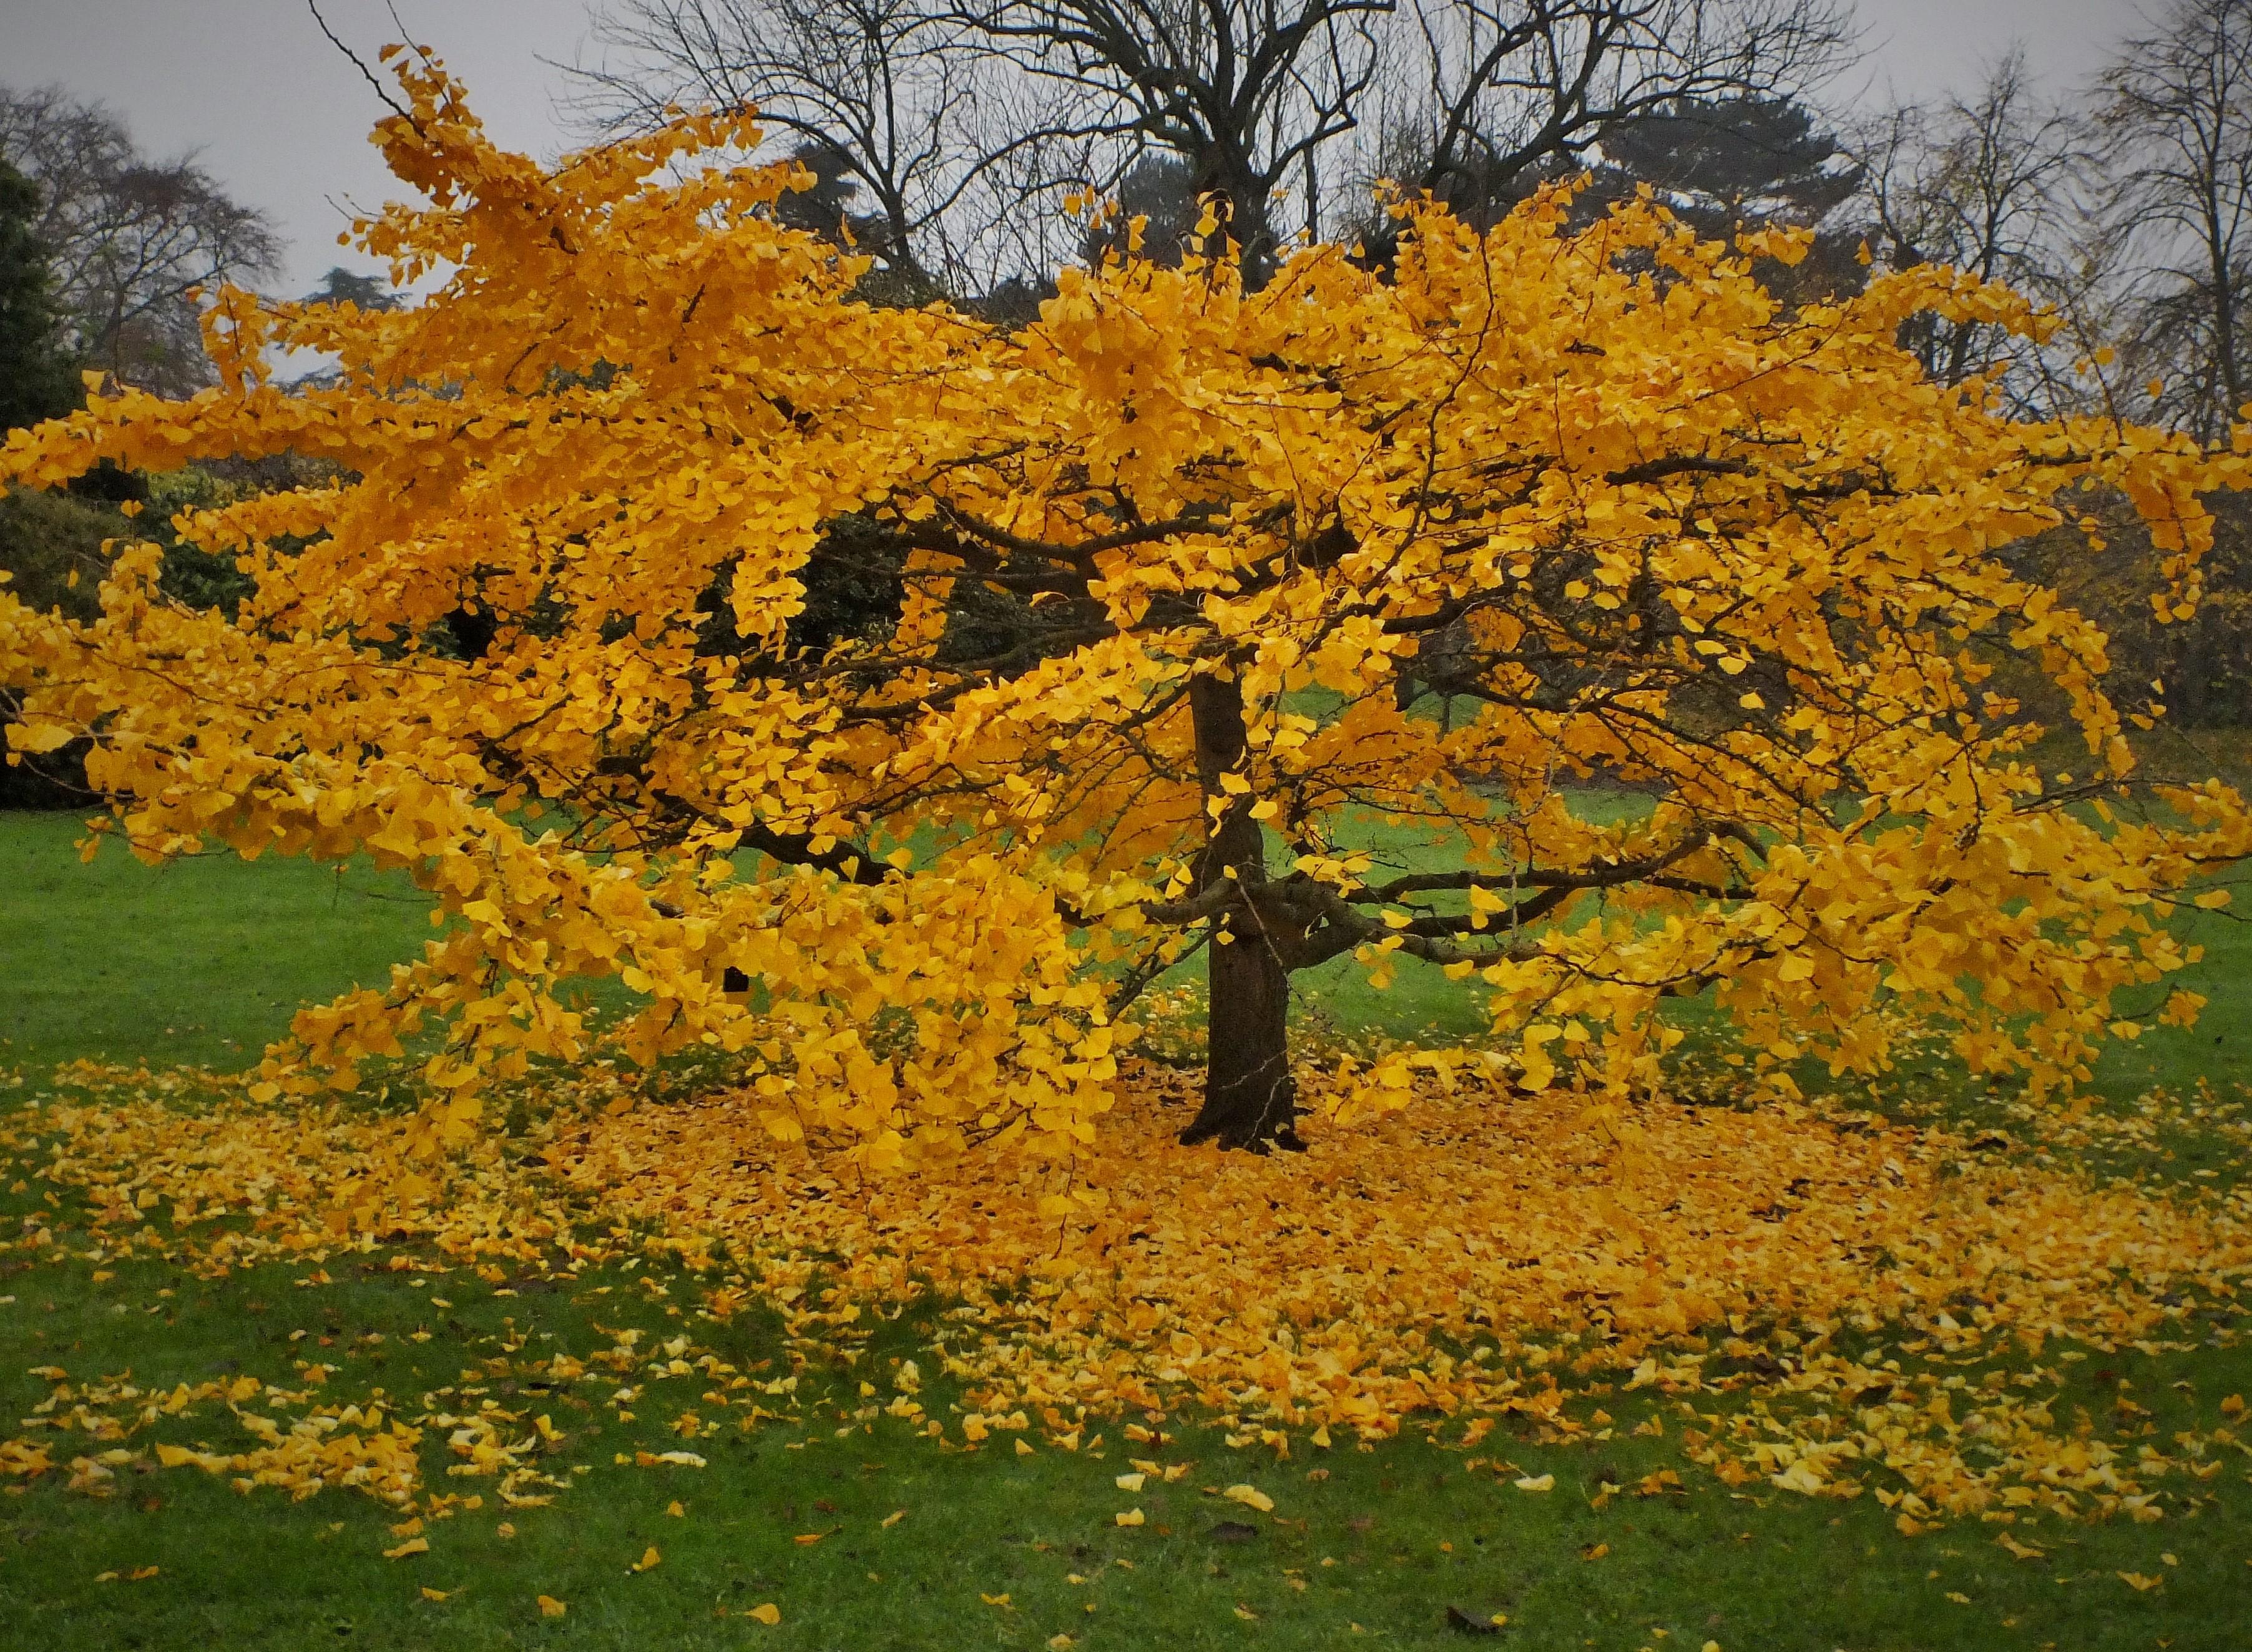 Gilded Trees – Ginkgo biloba and Parrotia persica at Kew Gardens ...